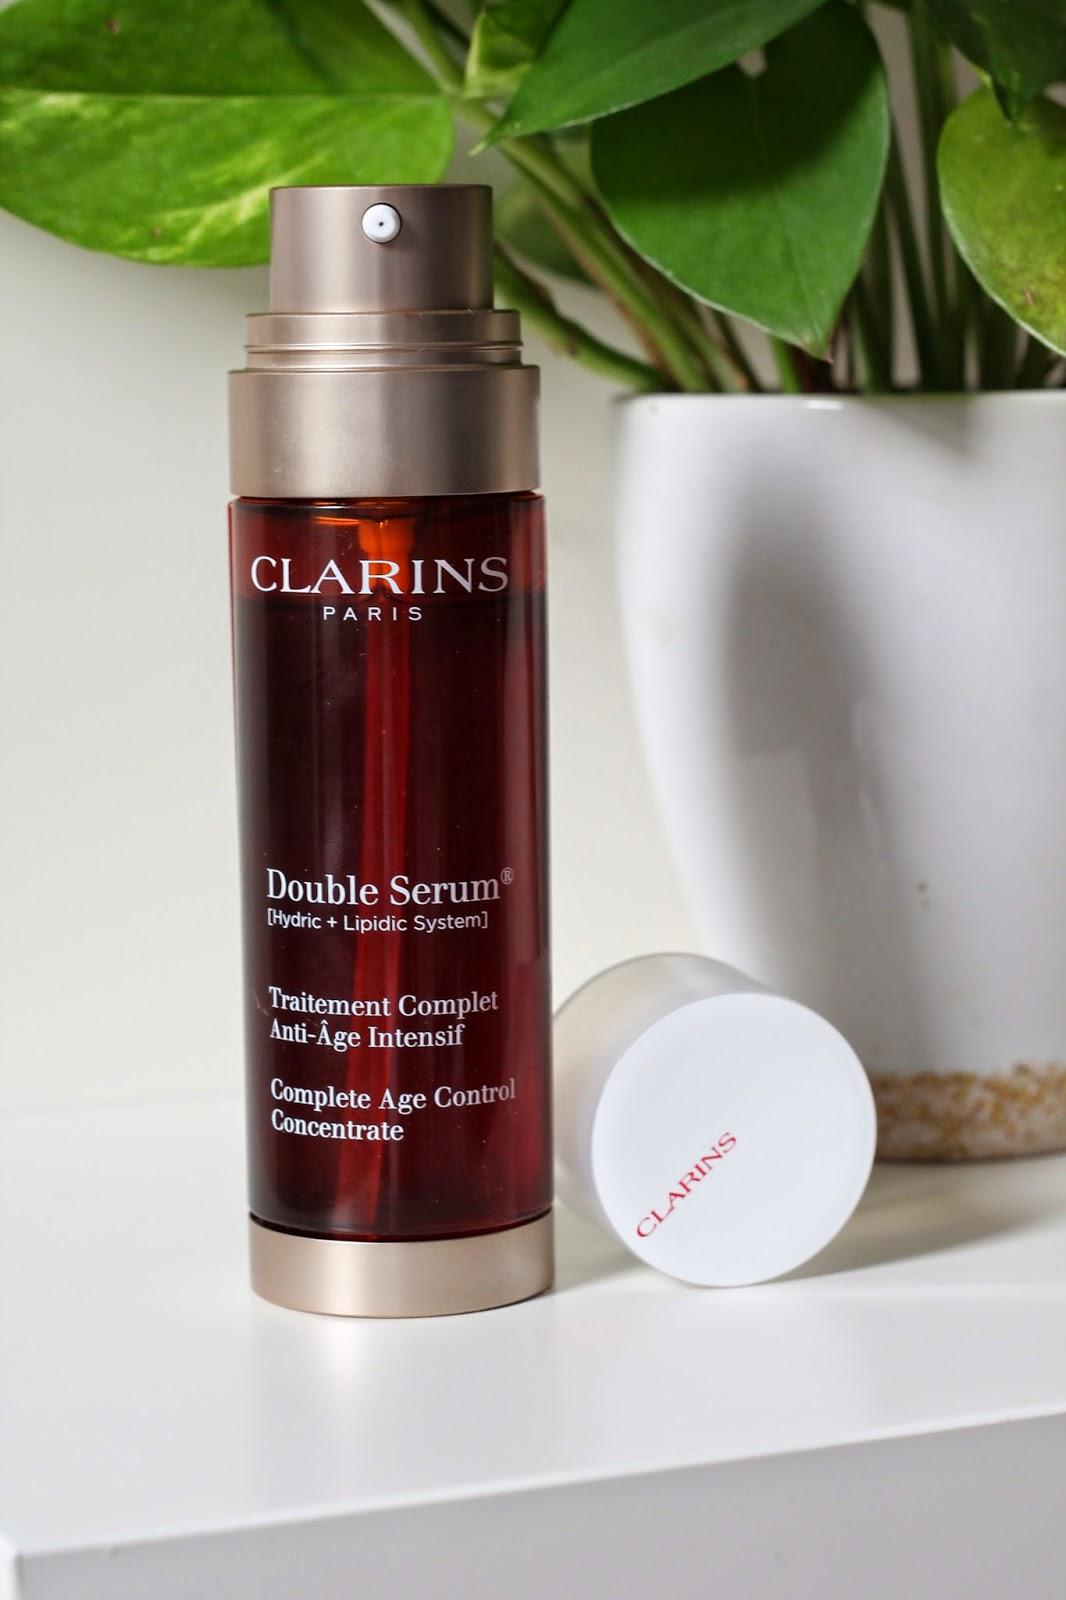 Clarins Extra Firming Facial Mask - Be Beautiful